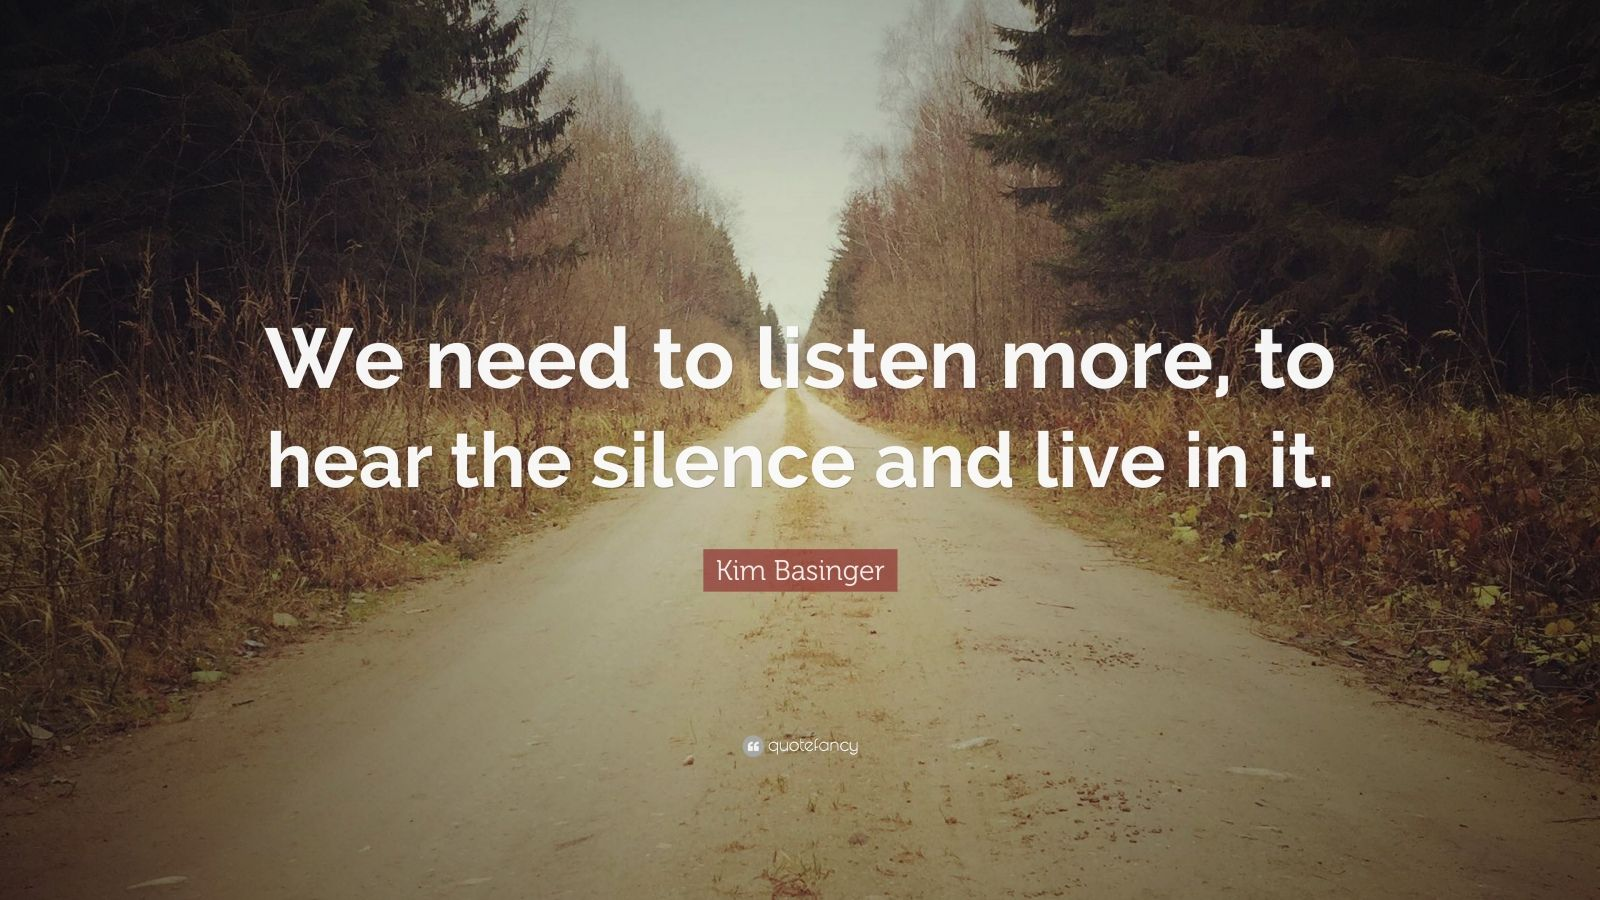 Kim Basinger Quotes (62 wallpapers) - Quotefancy